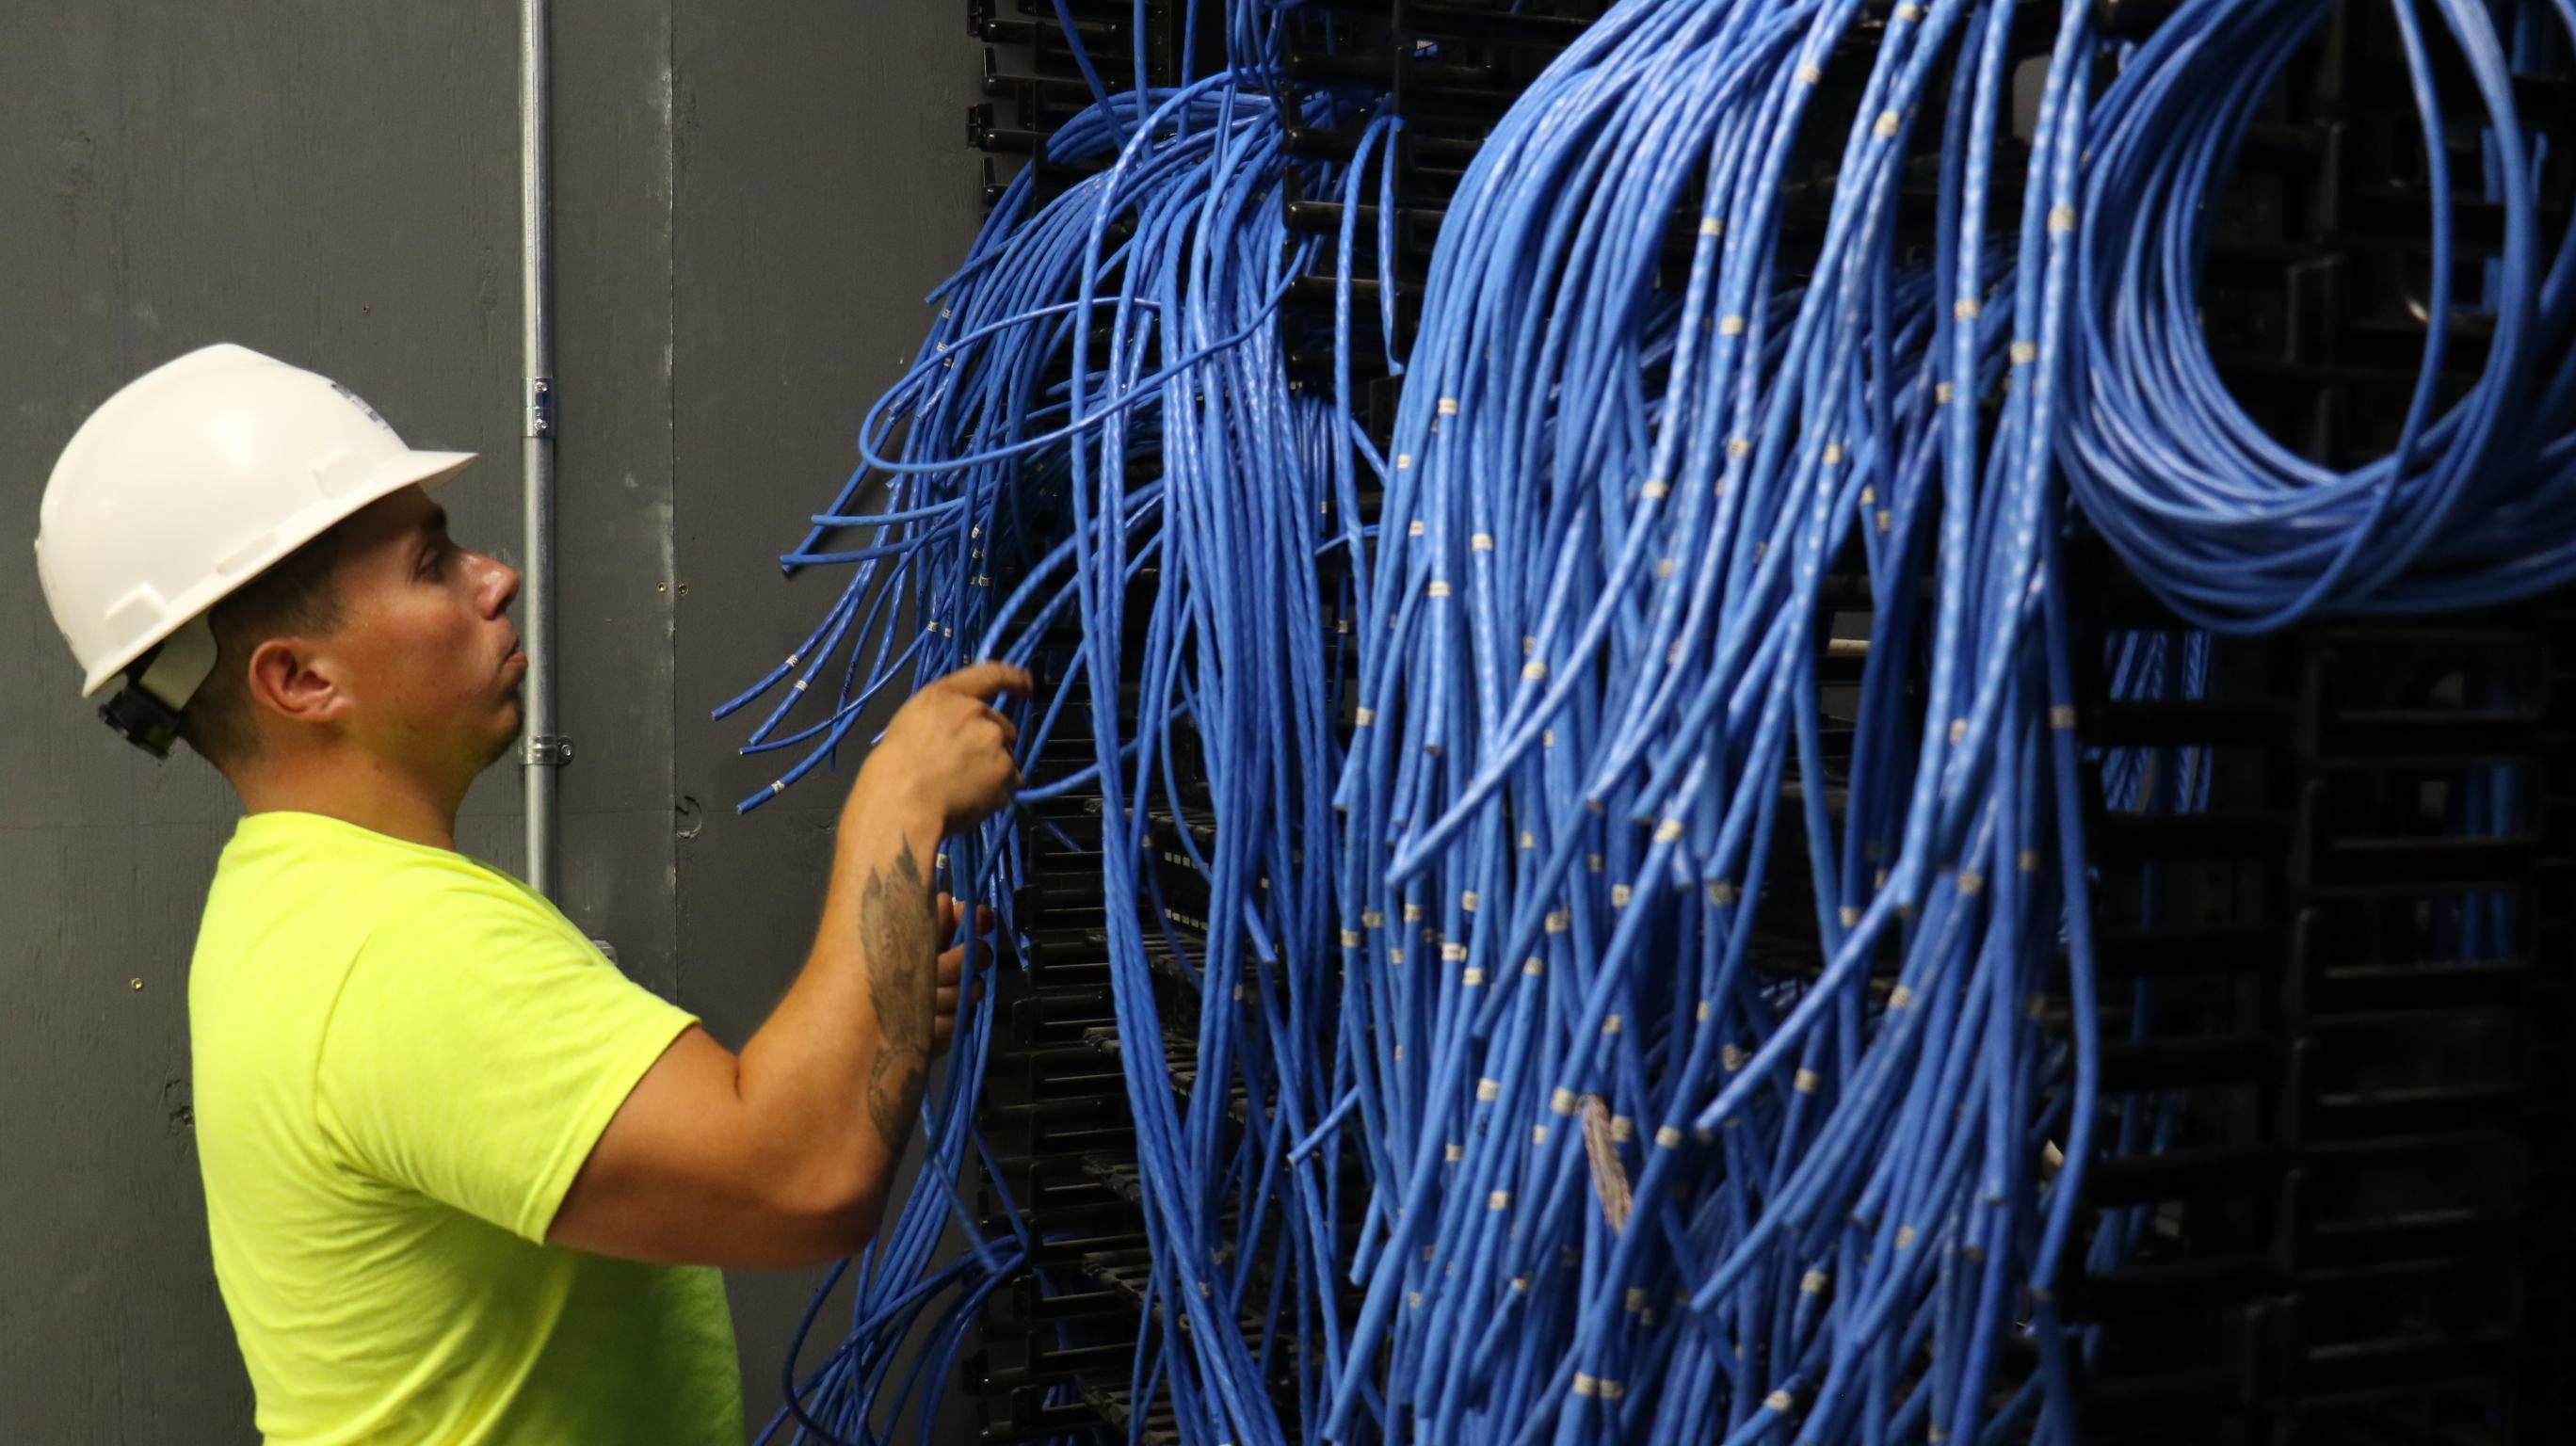 St. Regis Mohawk Tribe Admin Building - Network Communication Design & Cabling